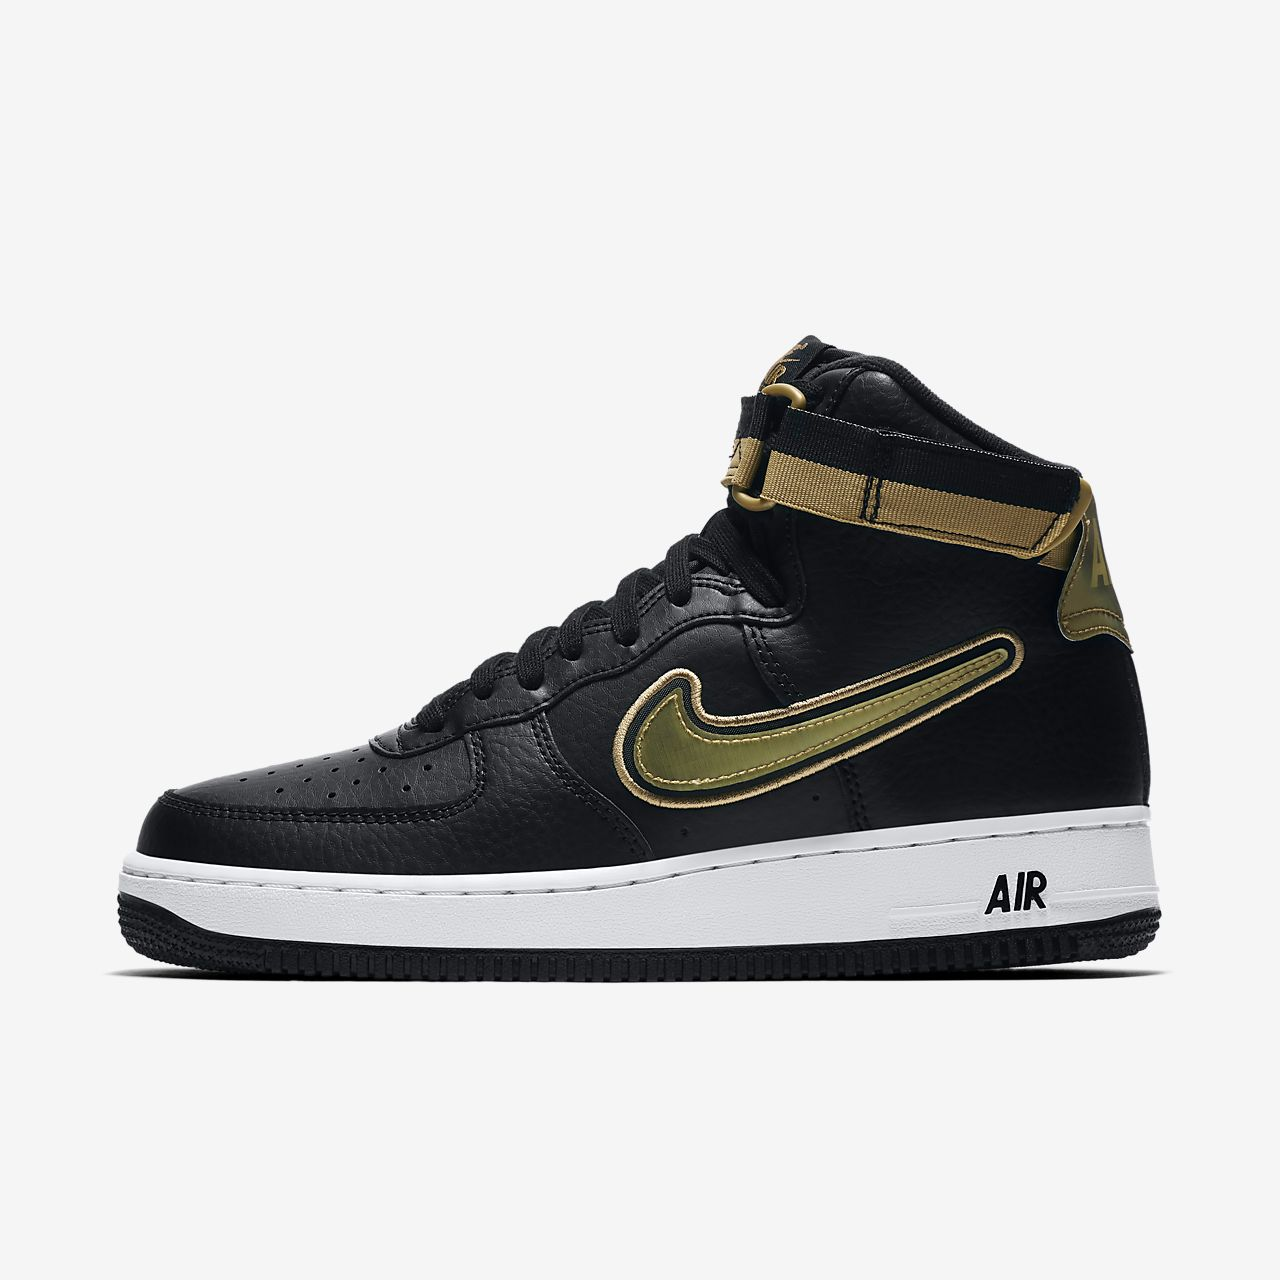 new concept 30abf c9c4a ... Nike Air Force 1 High  07 LV8 Sport NBA-sko för män